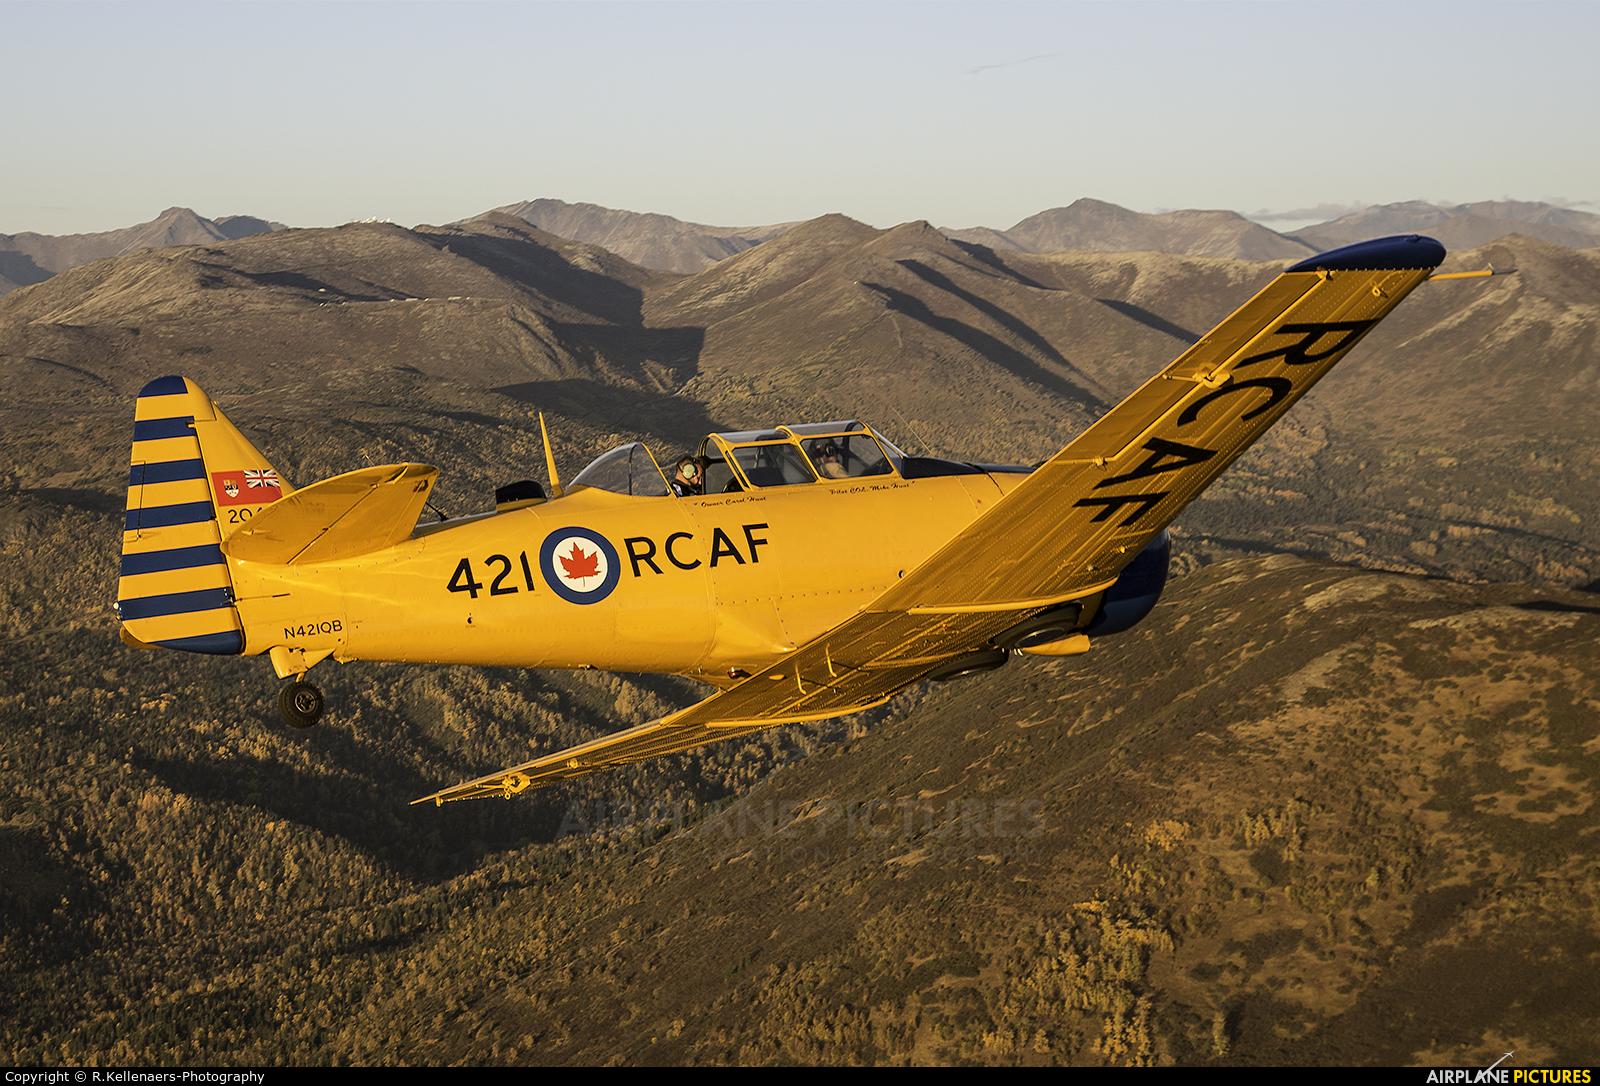 Private N421QB aircraft at In Flight - Alaska